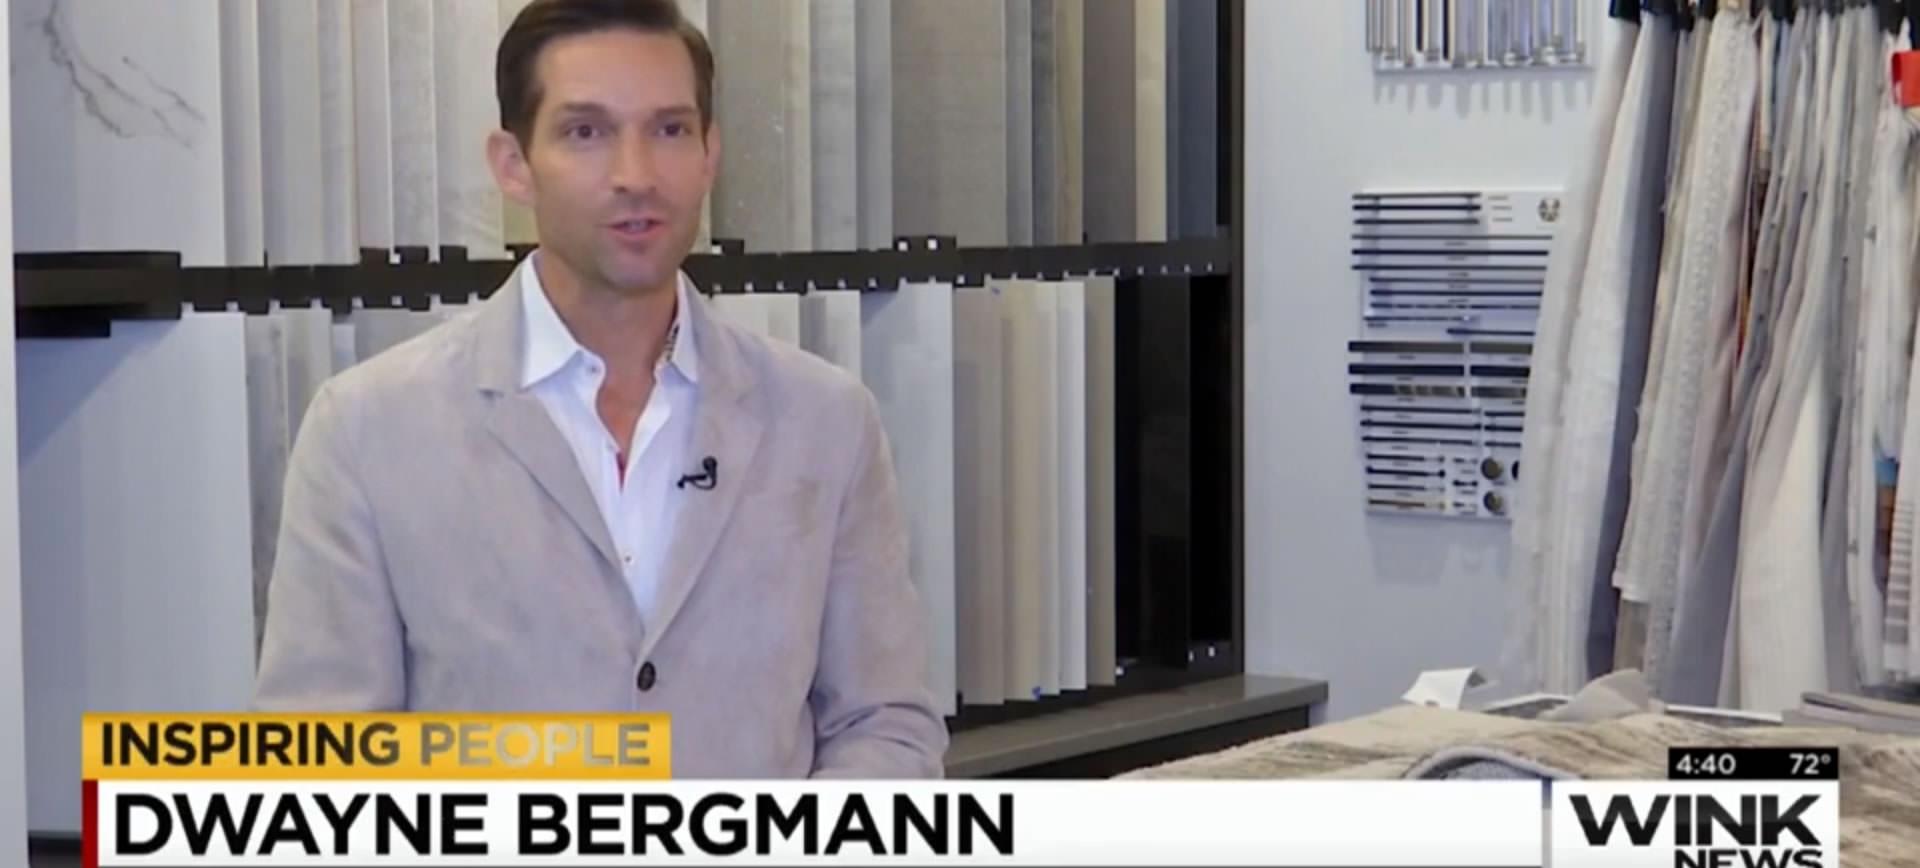 WINK TV: Inspiring People: Dwayne Bergmann doesn't think like many other interior designers